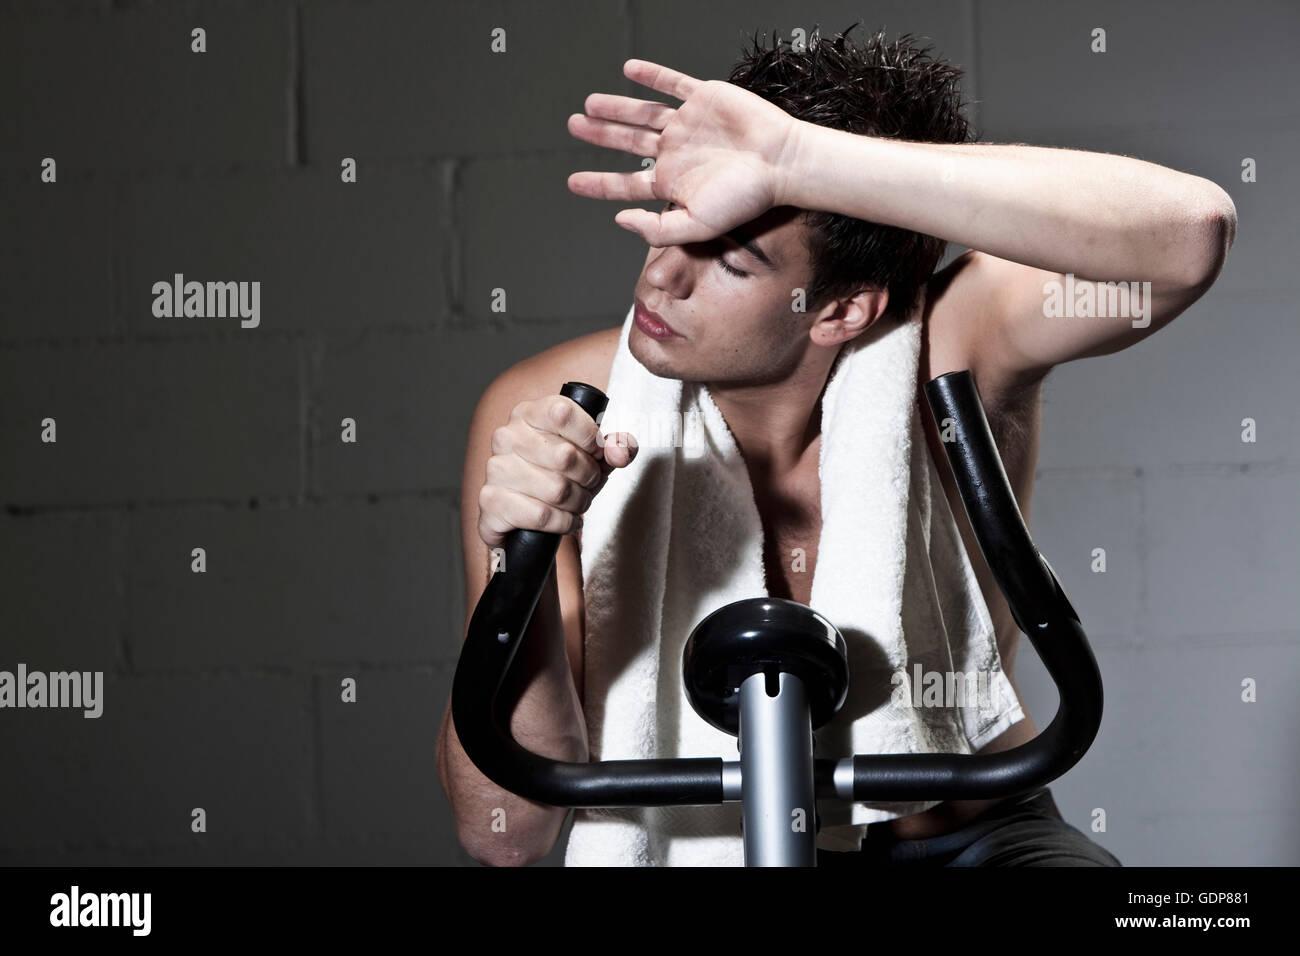 Hombre con máquina de ejercicio moping frente Imagen De Stock